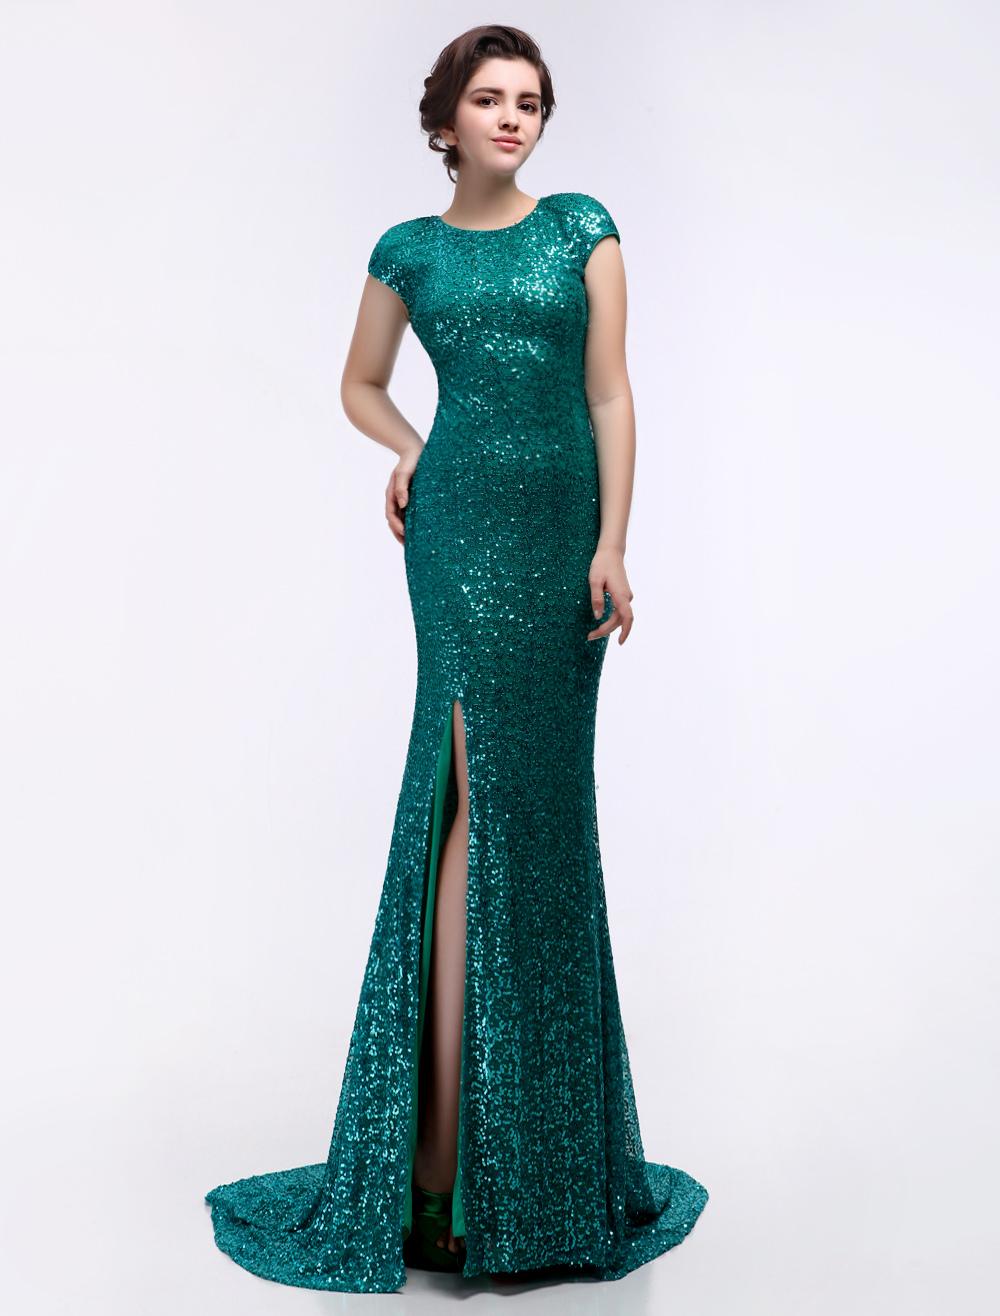 Dark Green Sequined Split Mermaid Prom Dress (Wedding) photo